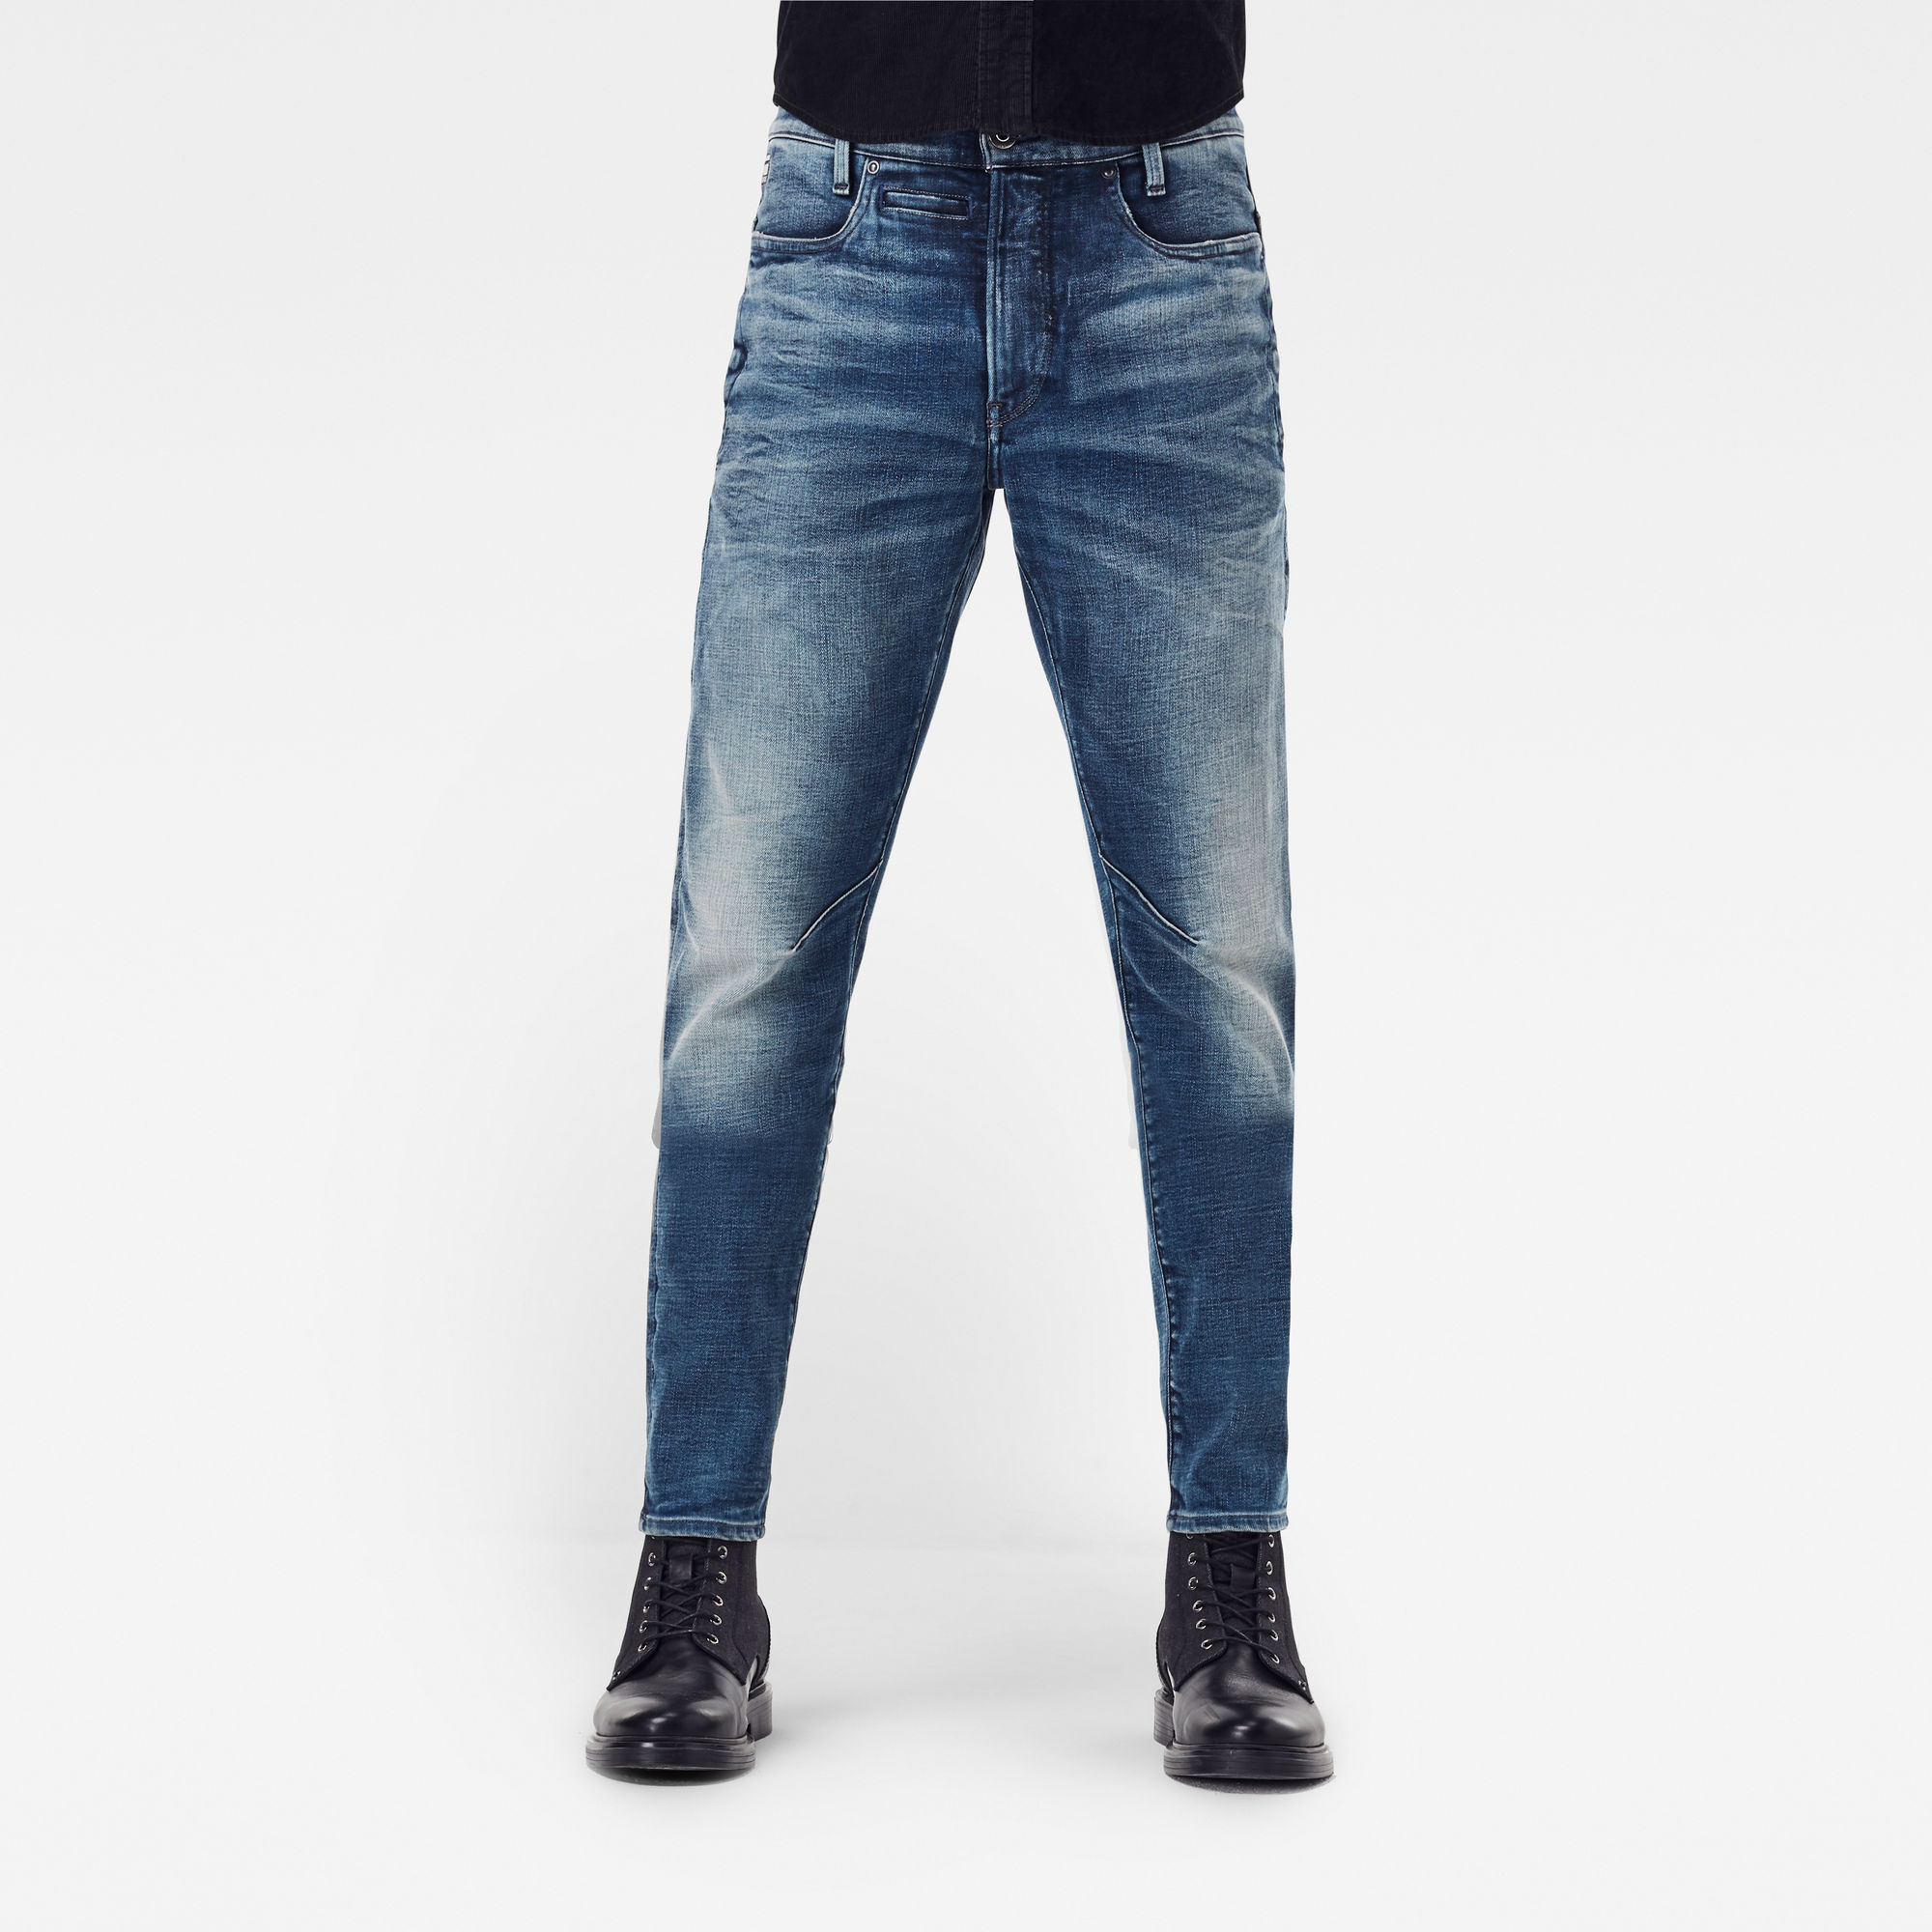 G-Star RAW Heren D-Staq 3D Slim Jeans Blauw